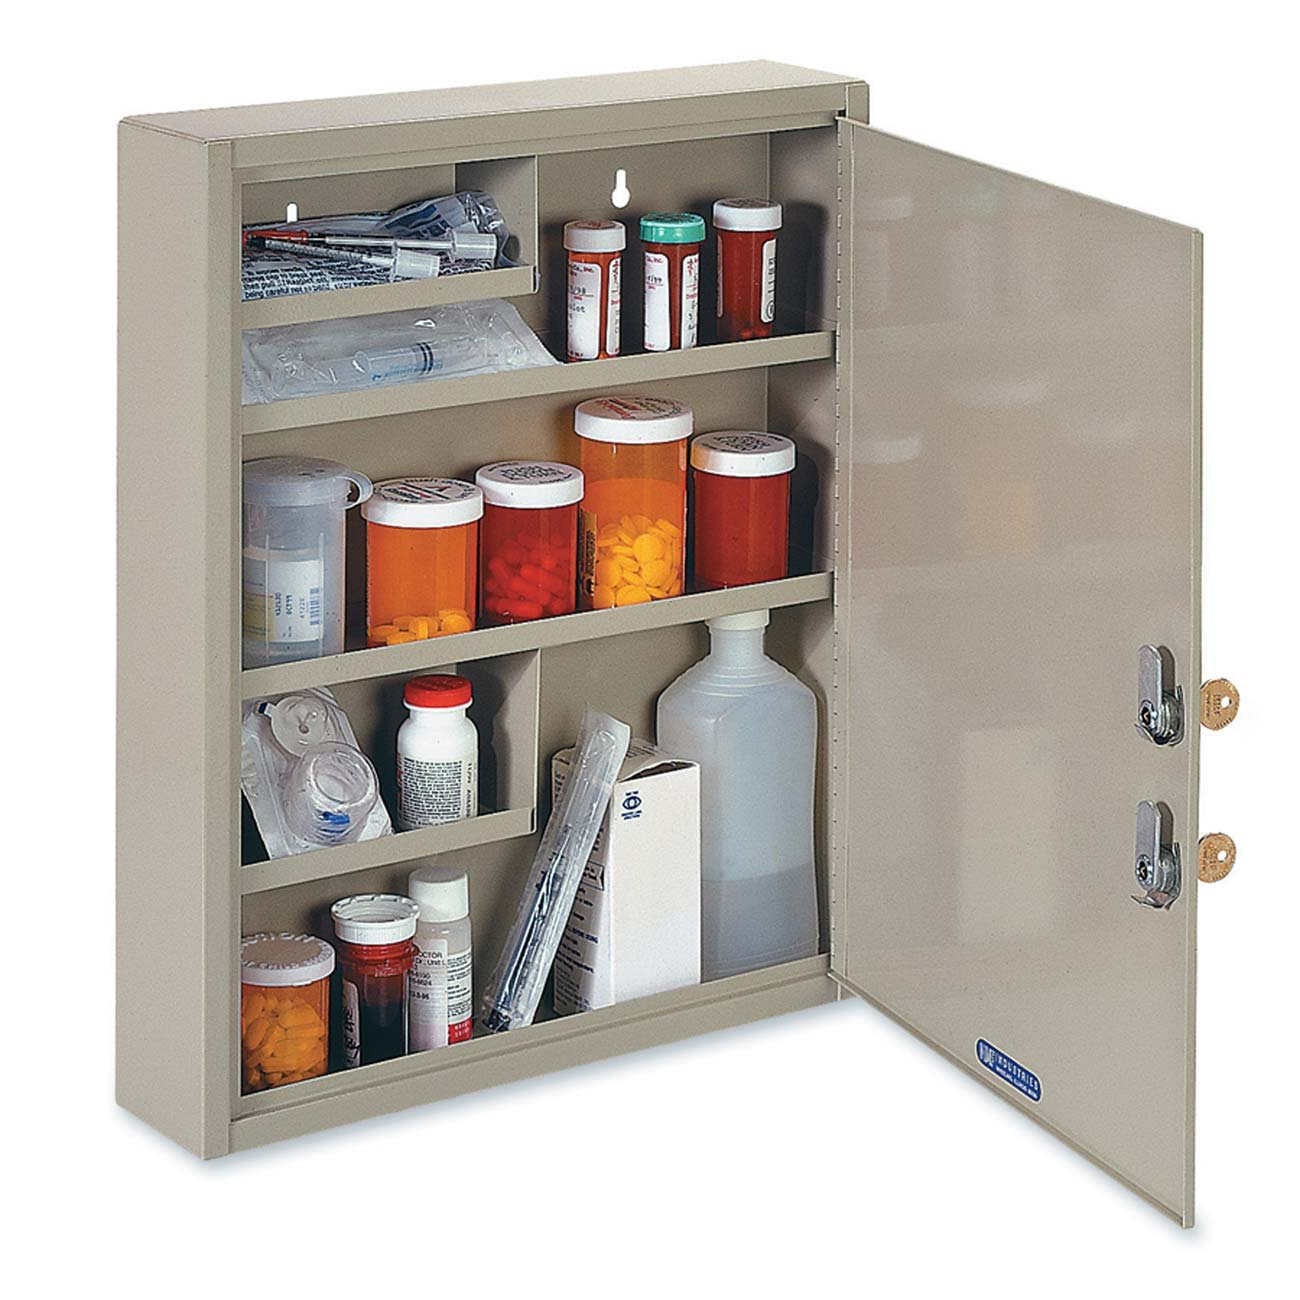 STEELMASTER Large Medical Security Cabinet, Dual Locks, Sand (2019065D03)